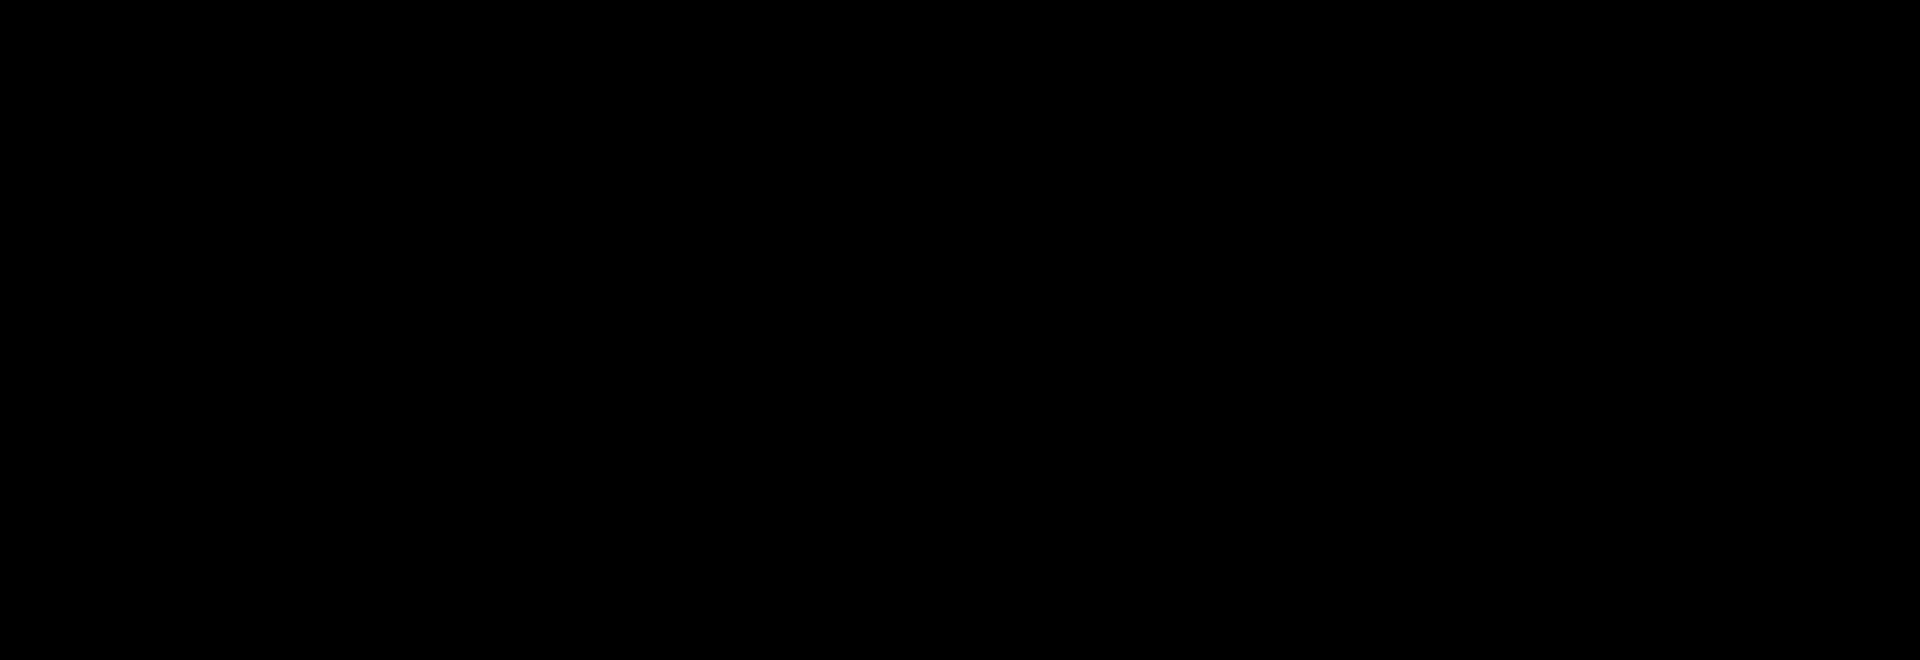 Salernitana - Virtus Entella. 11a g.